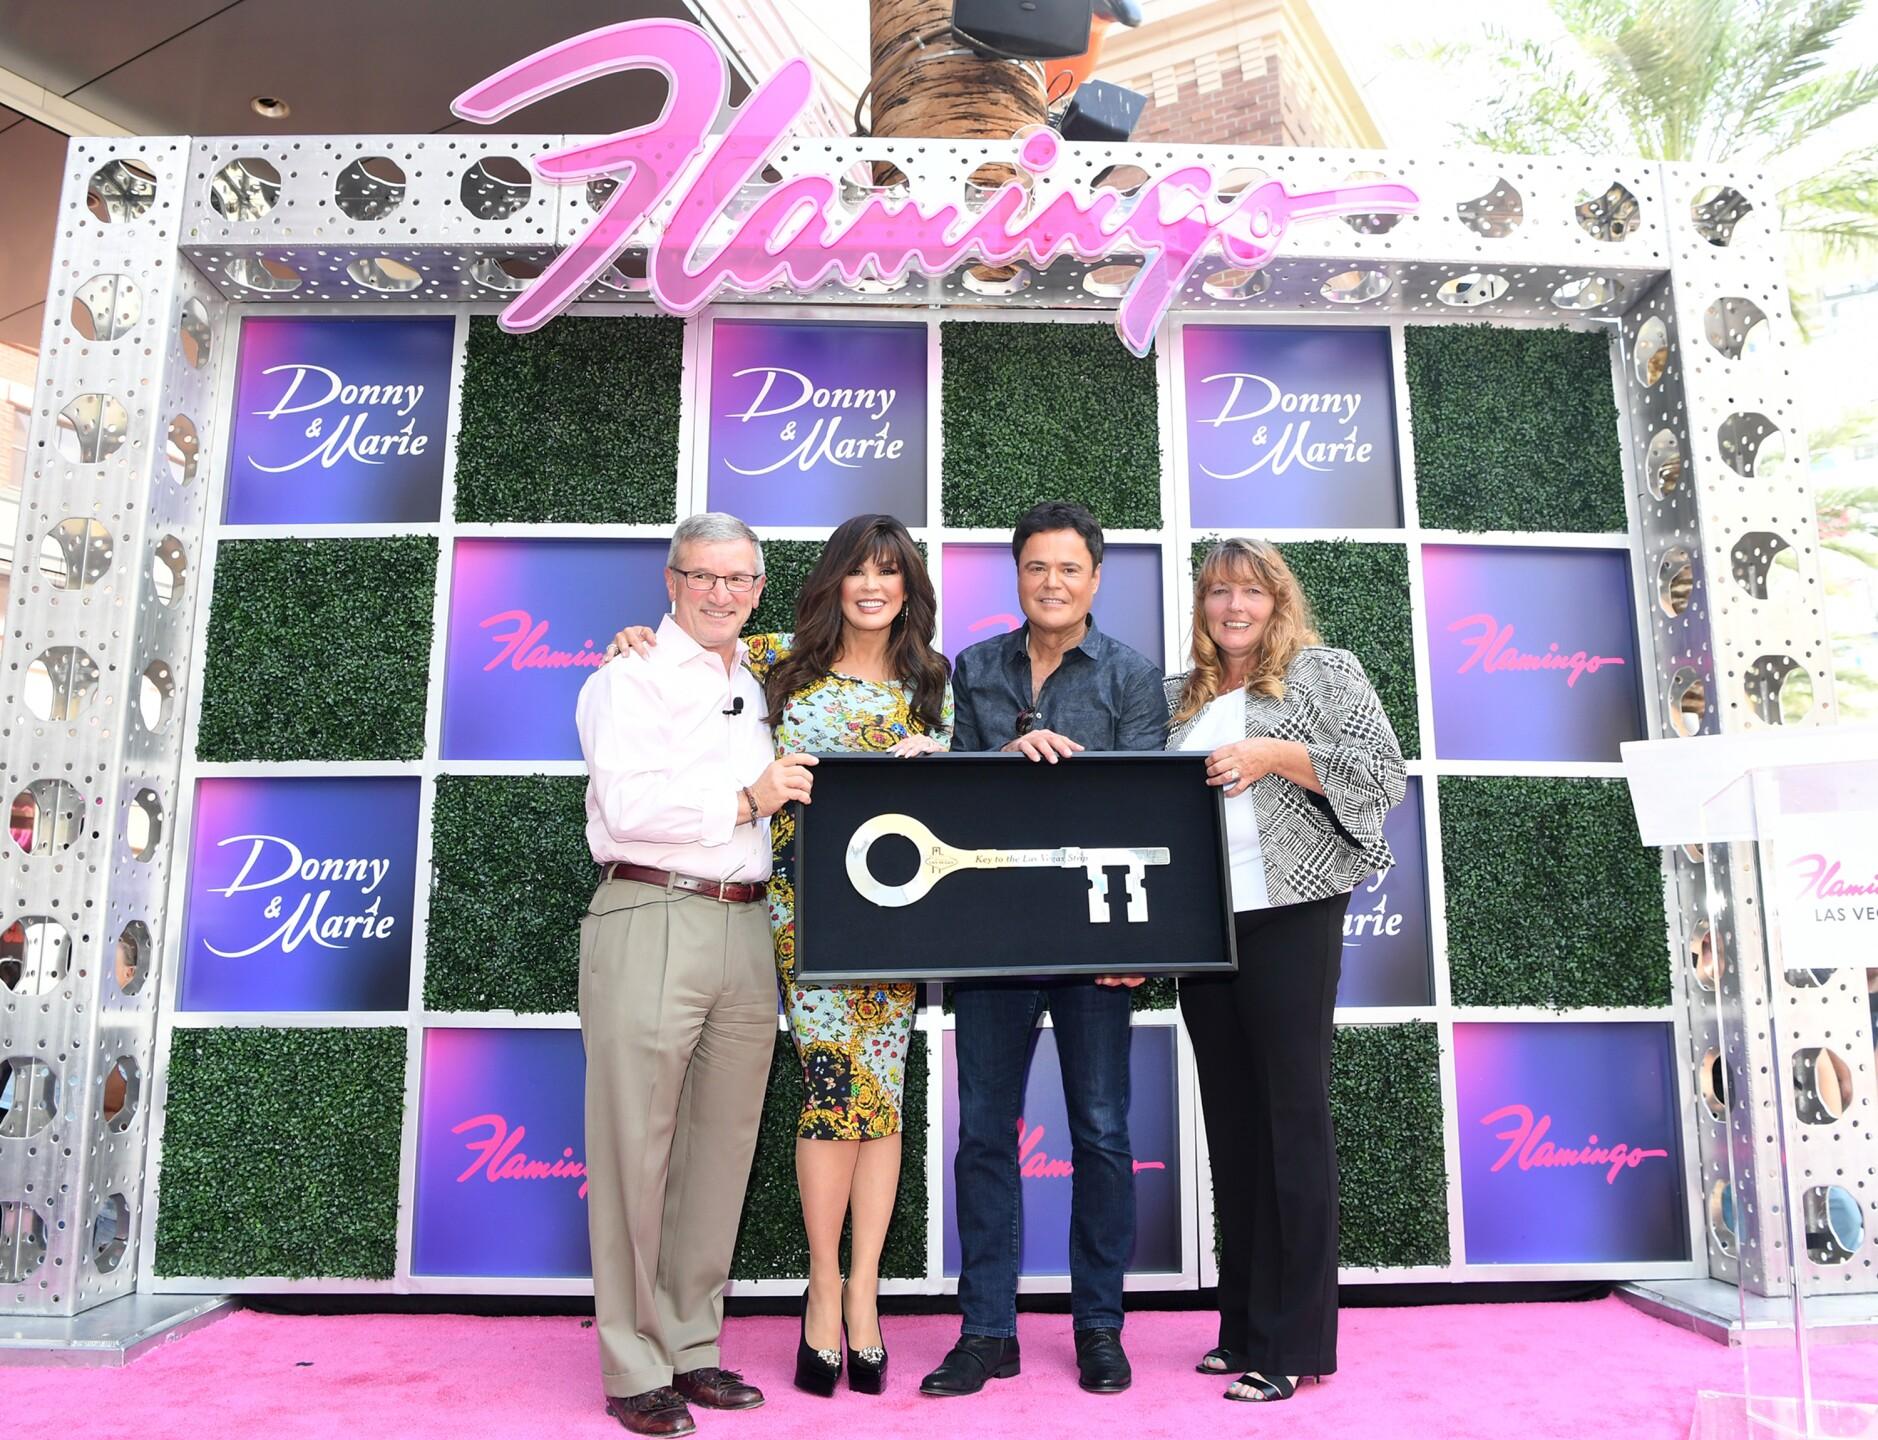 (L-R) Caesars Entertainment CEO Tony Rodio, Donny & Marie, Clark County Commission Chairwoman Marilyn Kirkpatrick; Key to the Las Vegas Strip at Flamingo Las Vegas_6.JPG